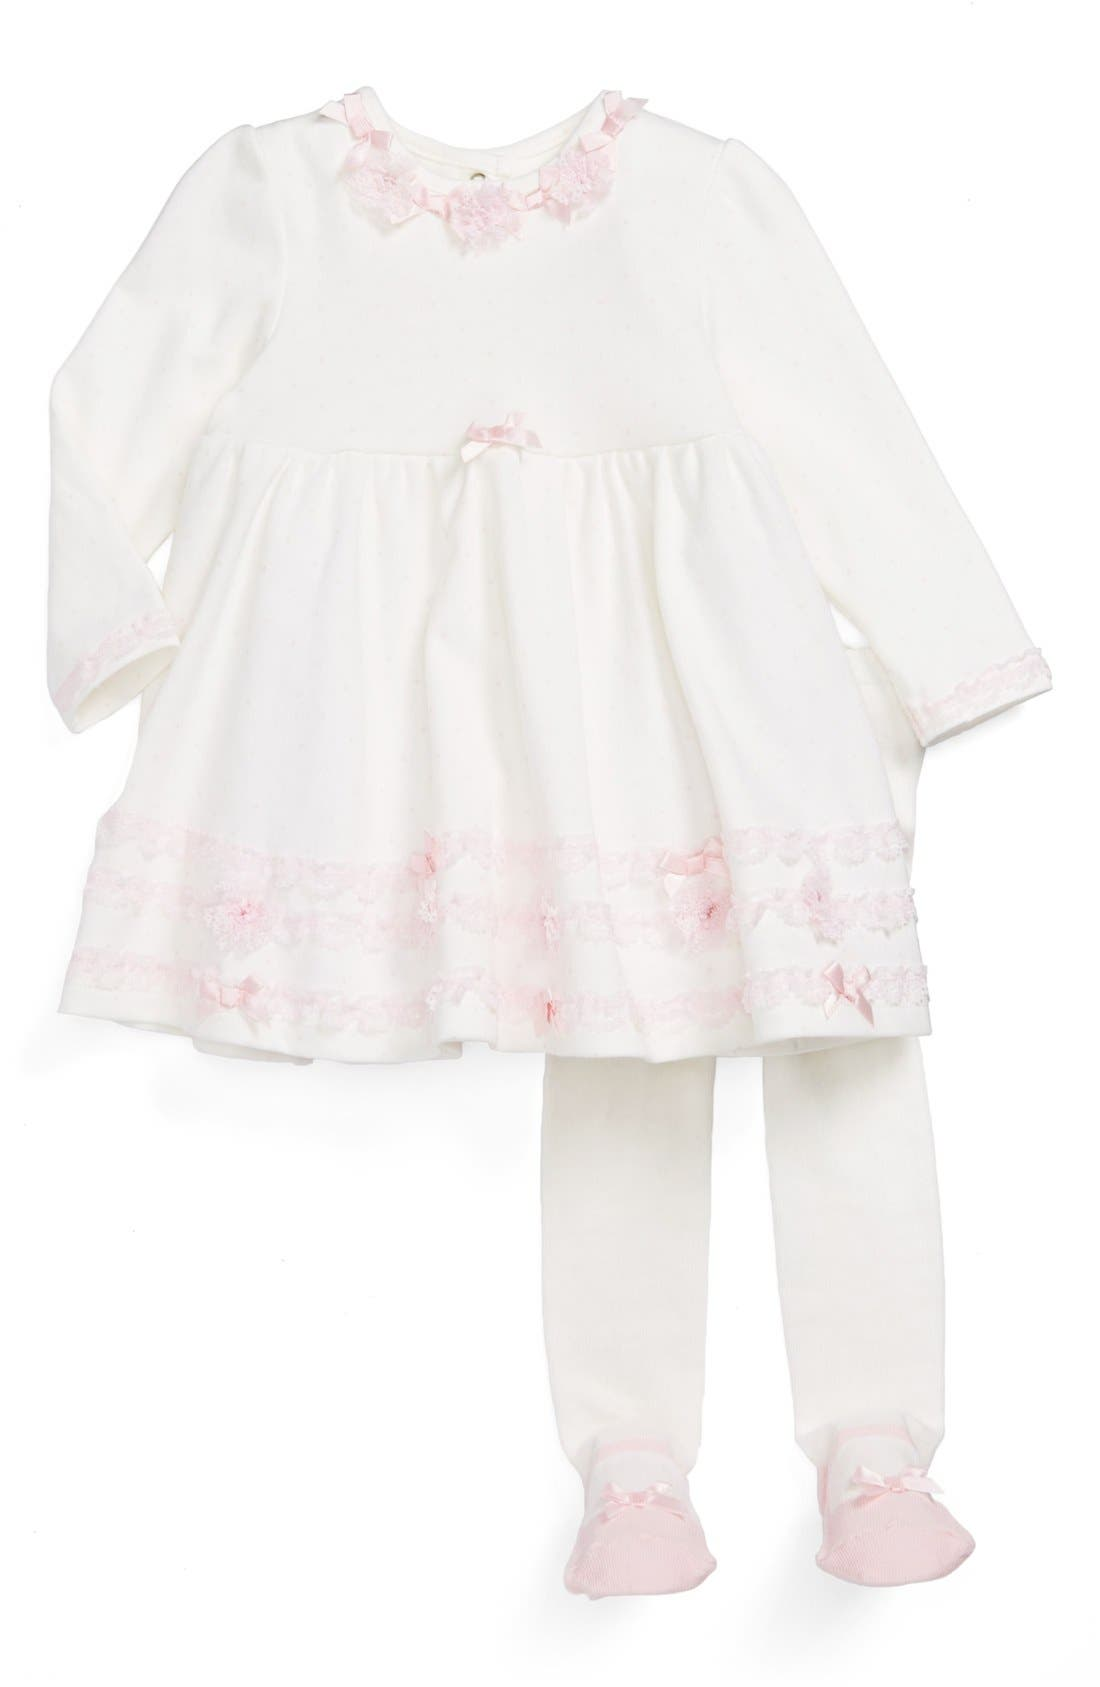 Alternate Image 1 Selected - Little Me Long Sleeve Lace Trim Dress & Footie Leggings (Baby Girls)